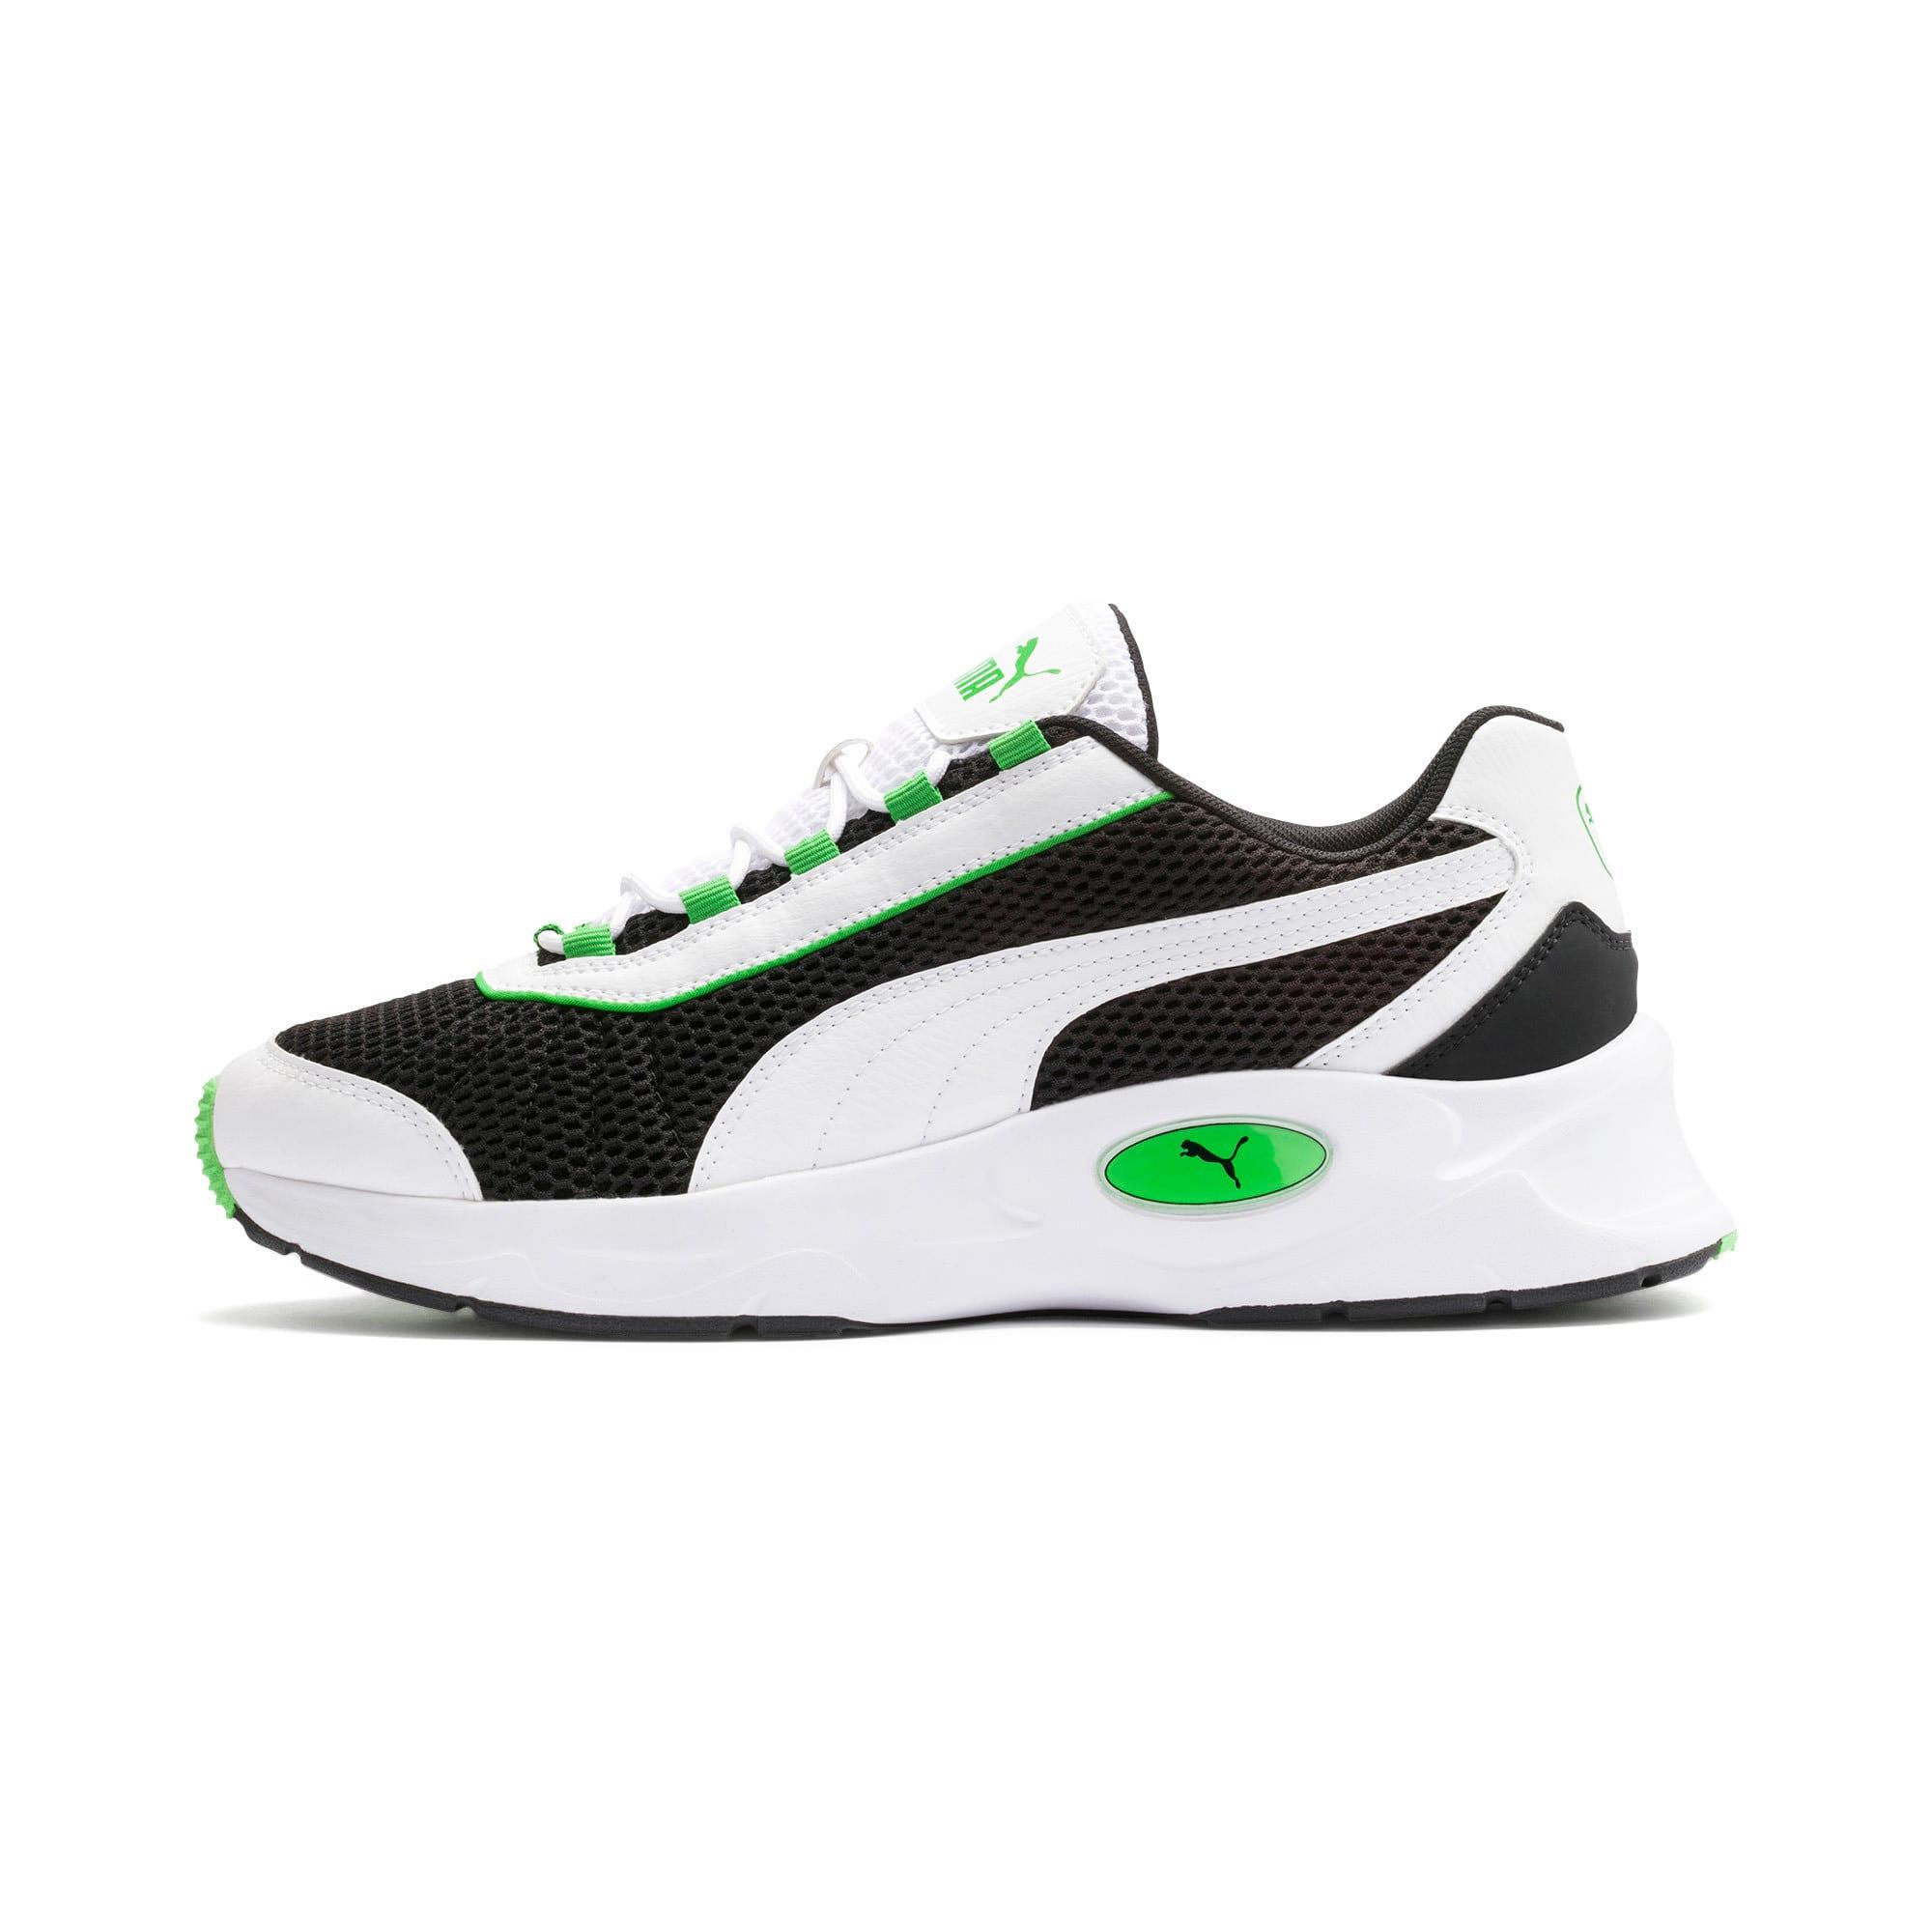 Imagen en miniatura 1 de Zapatillas de training Nucleus, Puma Black-Classic Green, mediana